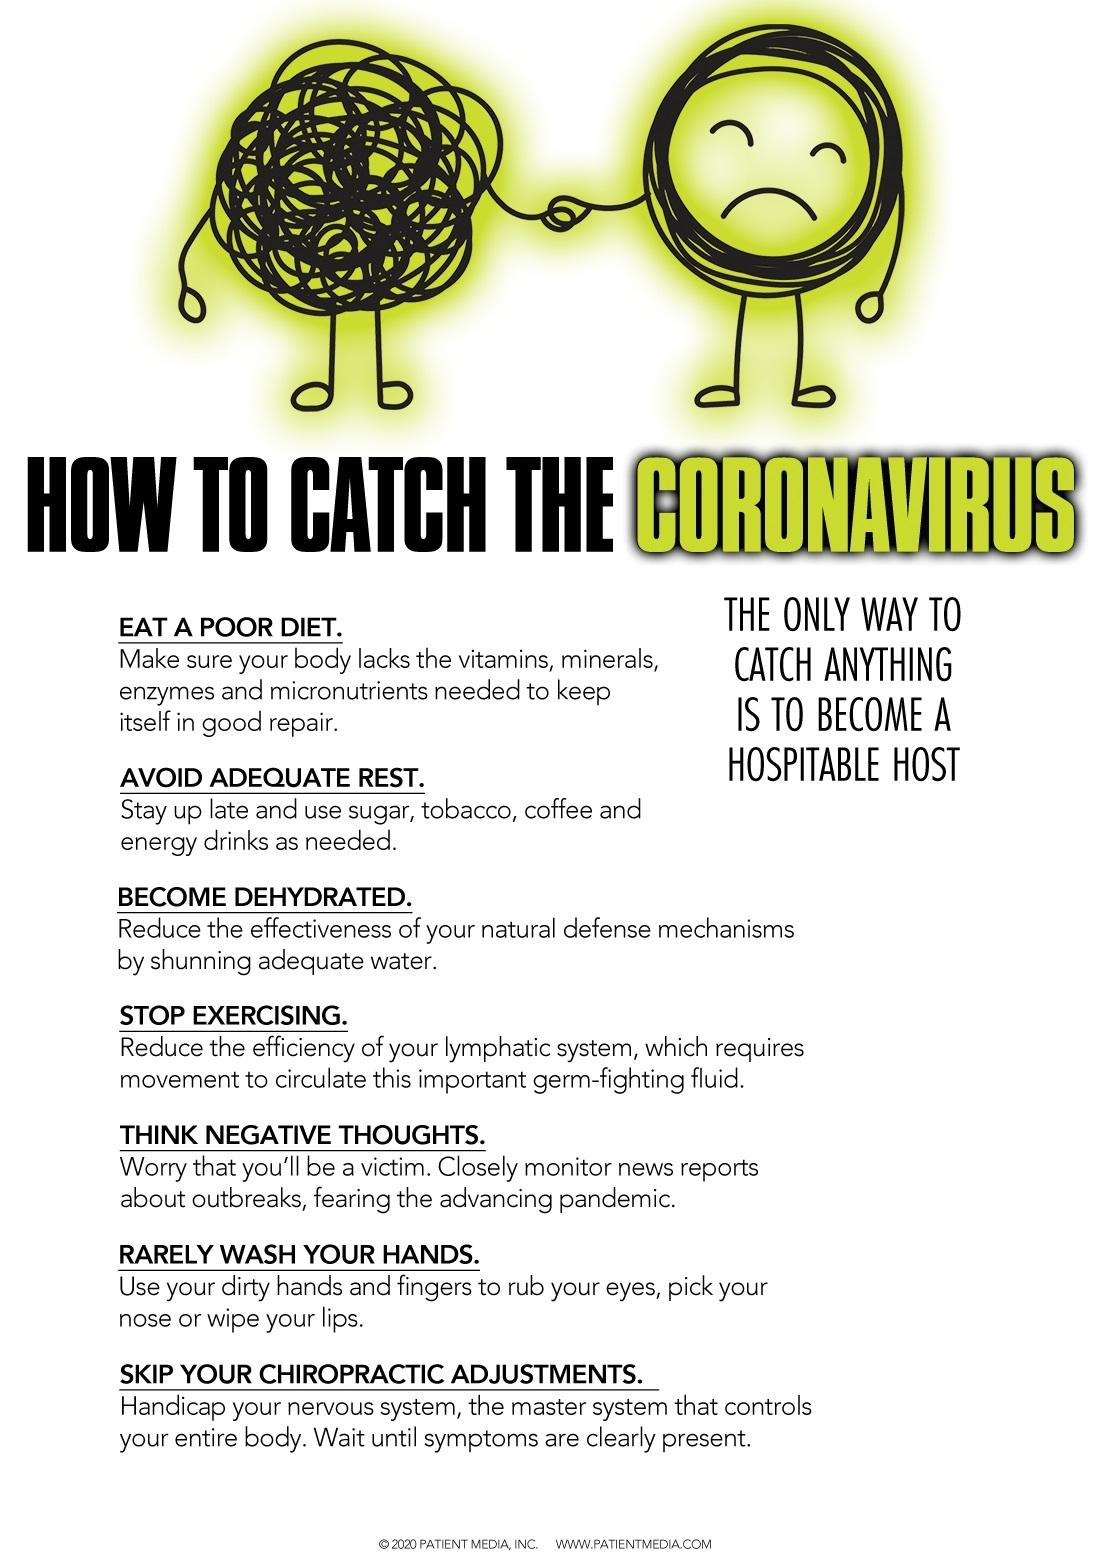 patientmedi-coronavirus